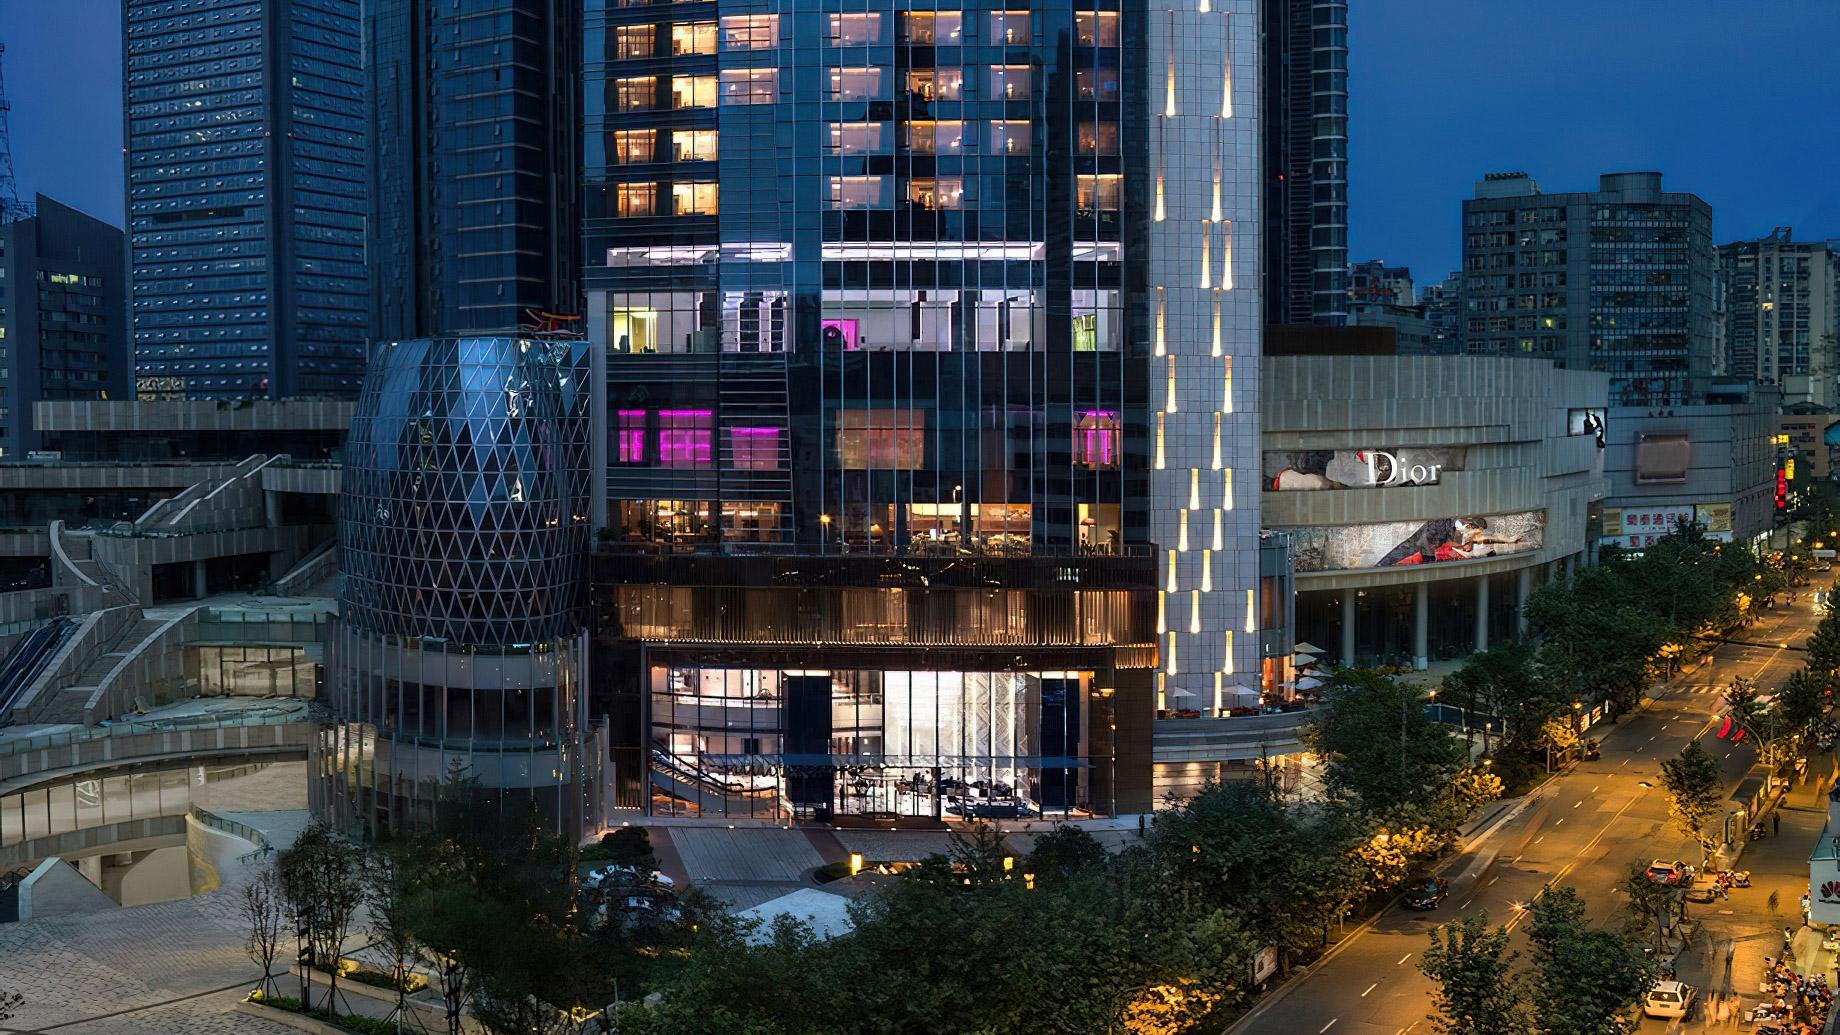 The St. Regis Chengdu Luxury Hotel - Chengdu, Sichuan, China - Hotel Exterior